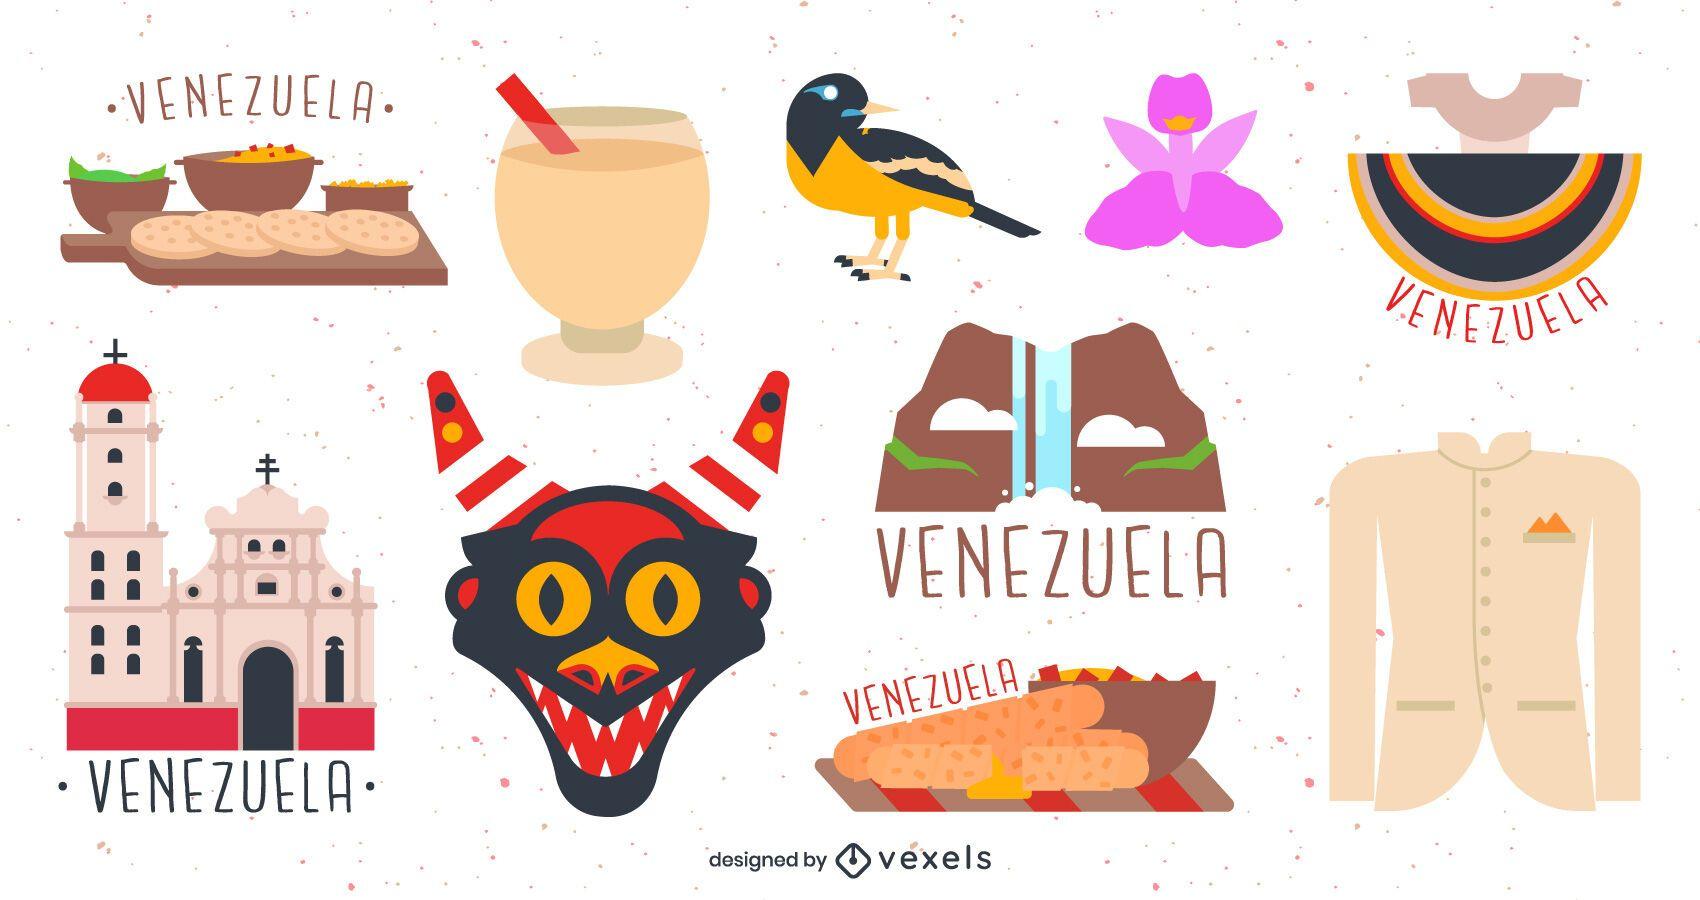 Venezuela elements set